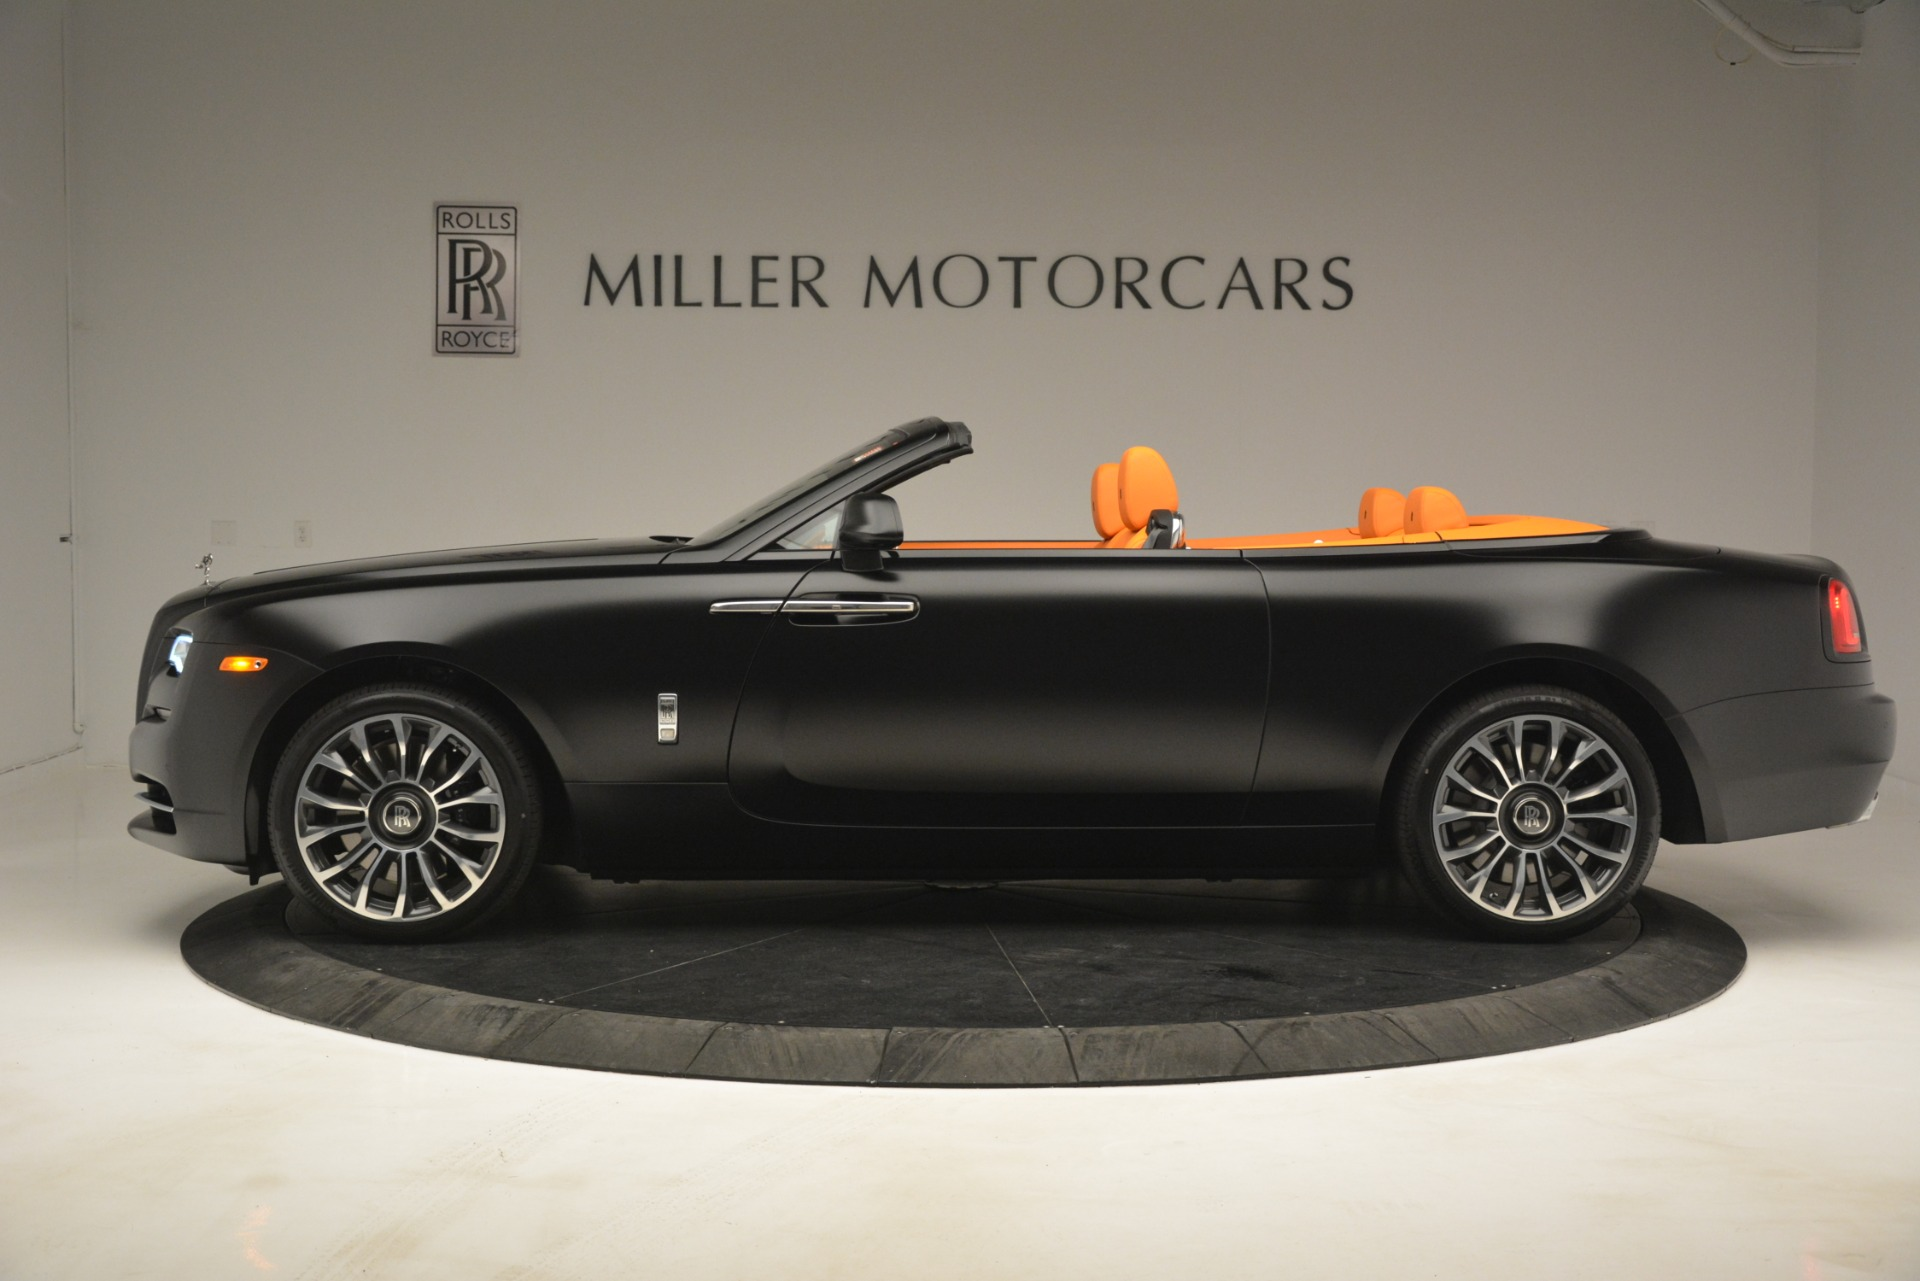 New 2019 Rolls-Royce Dawn  For Sale In Greenwich, CT 2695_p4